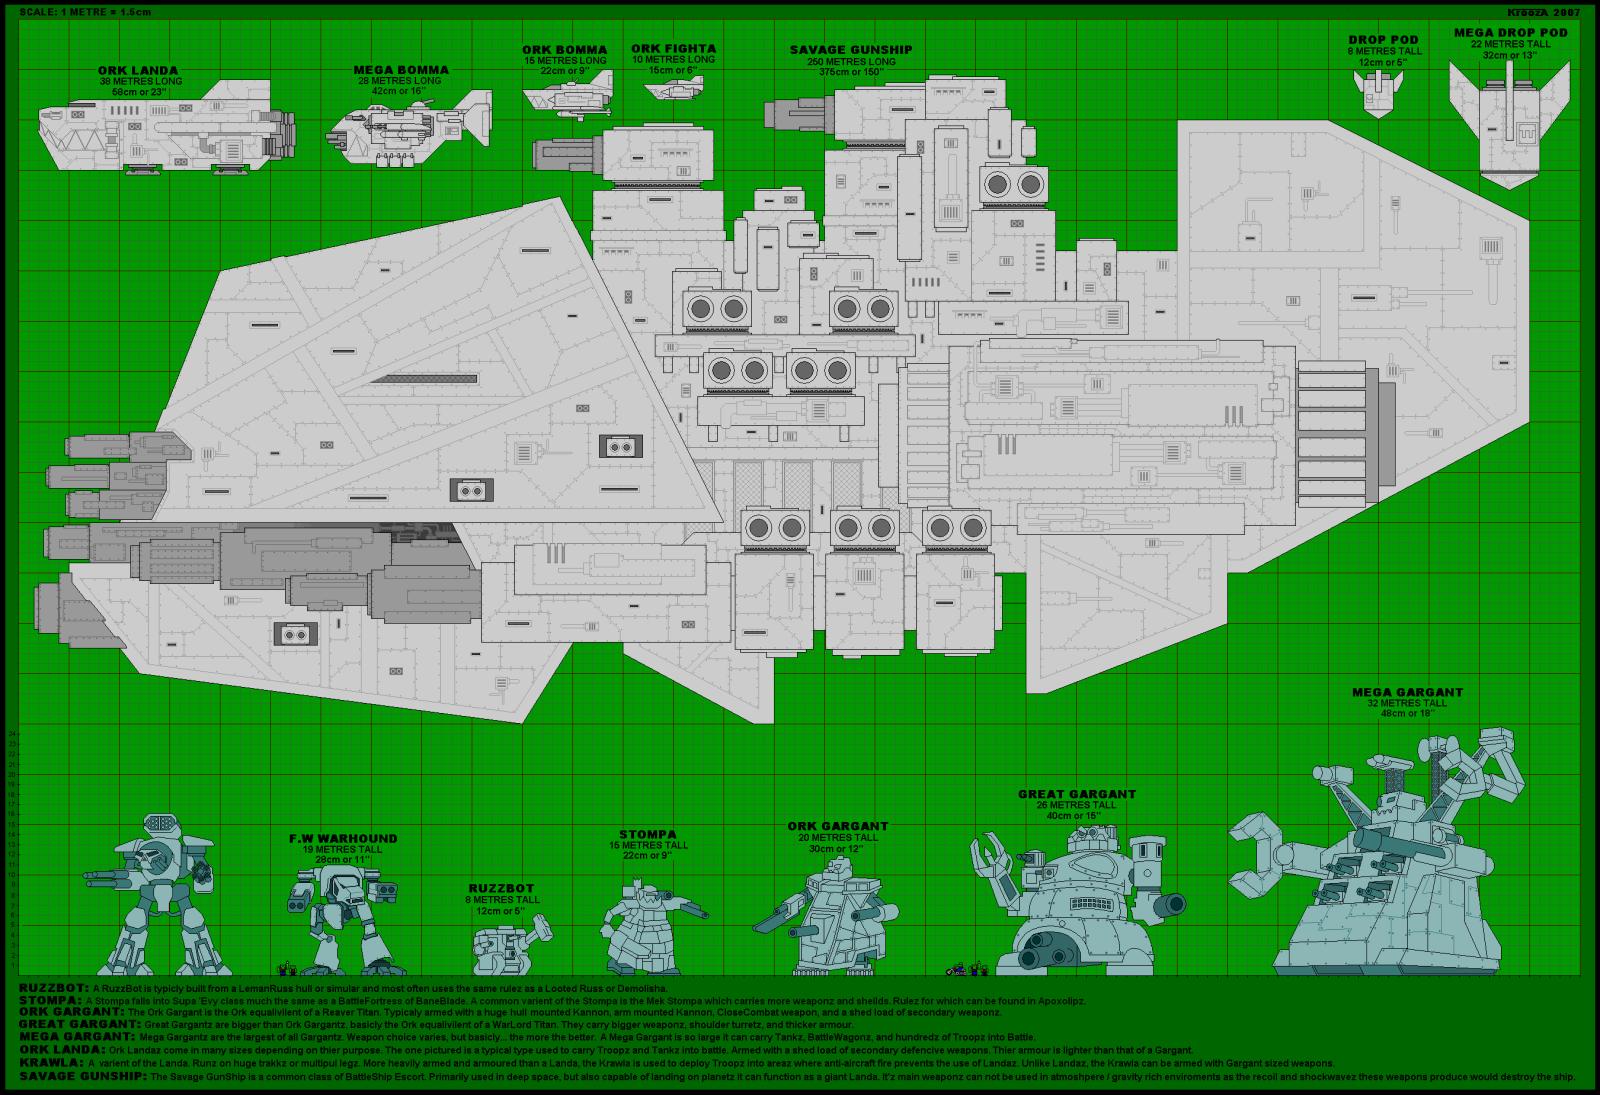 Ork Size Comparison image - Warhammer 40K Fan Group - Mod DB